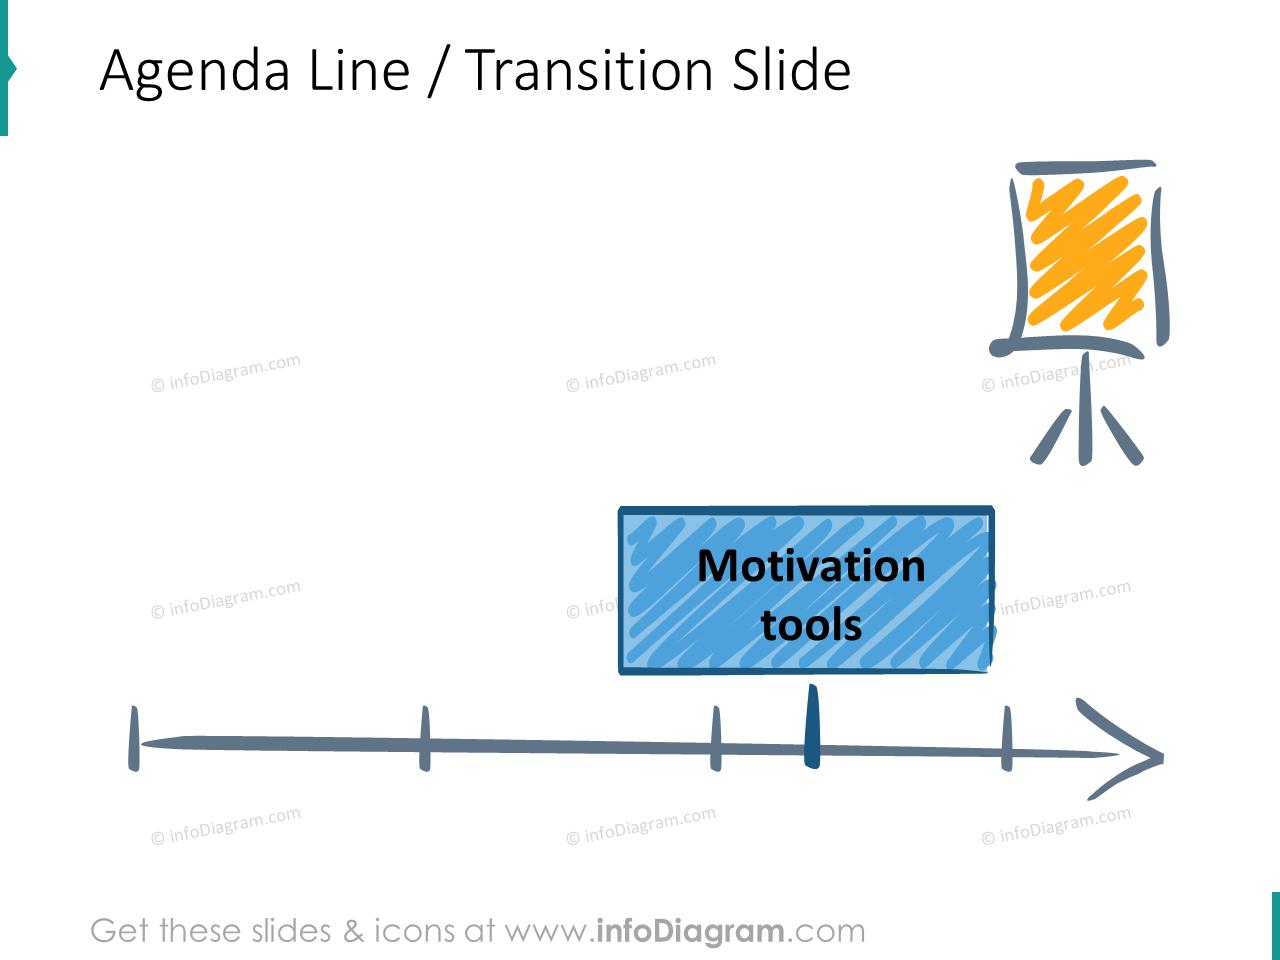 motivation training agenda transition slide tools icons ppt clipart